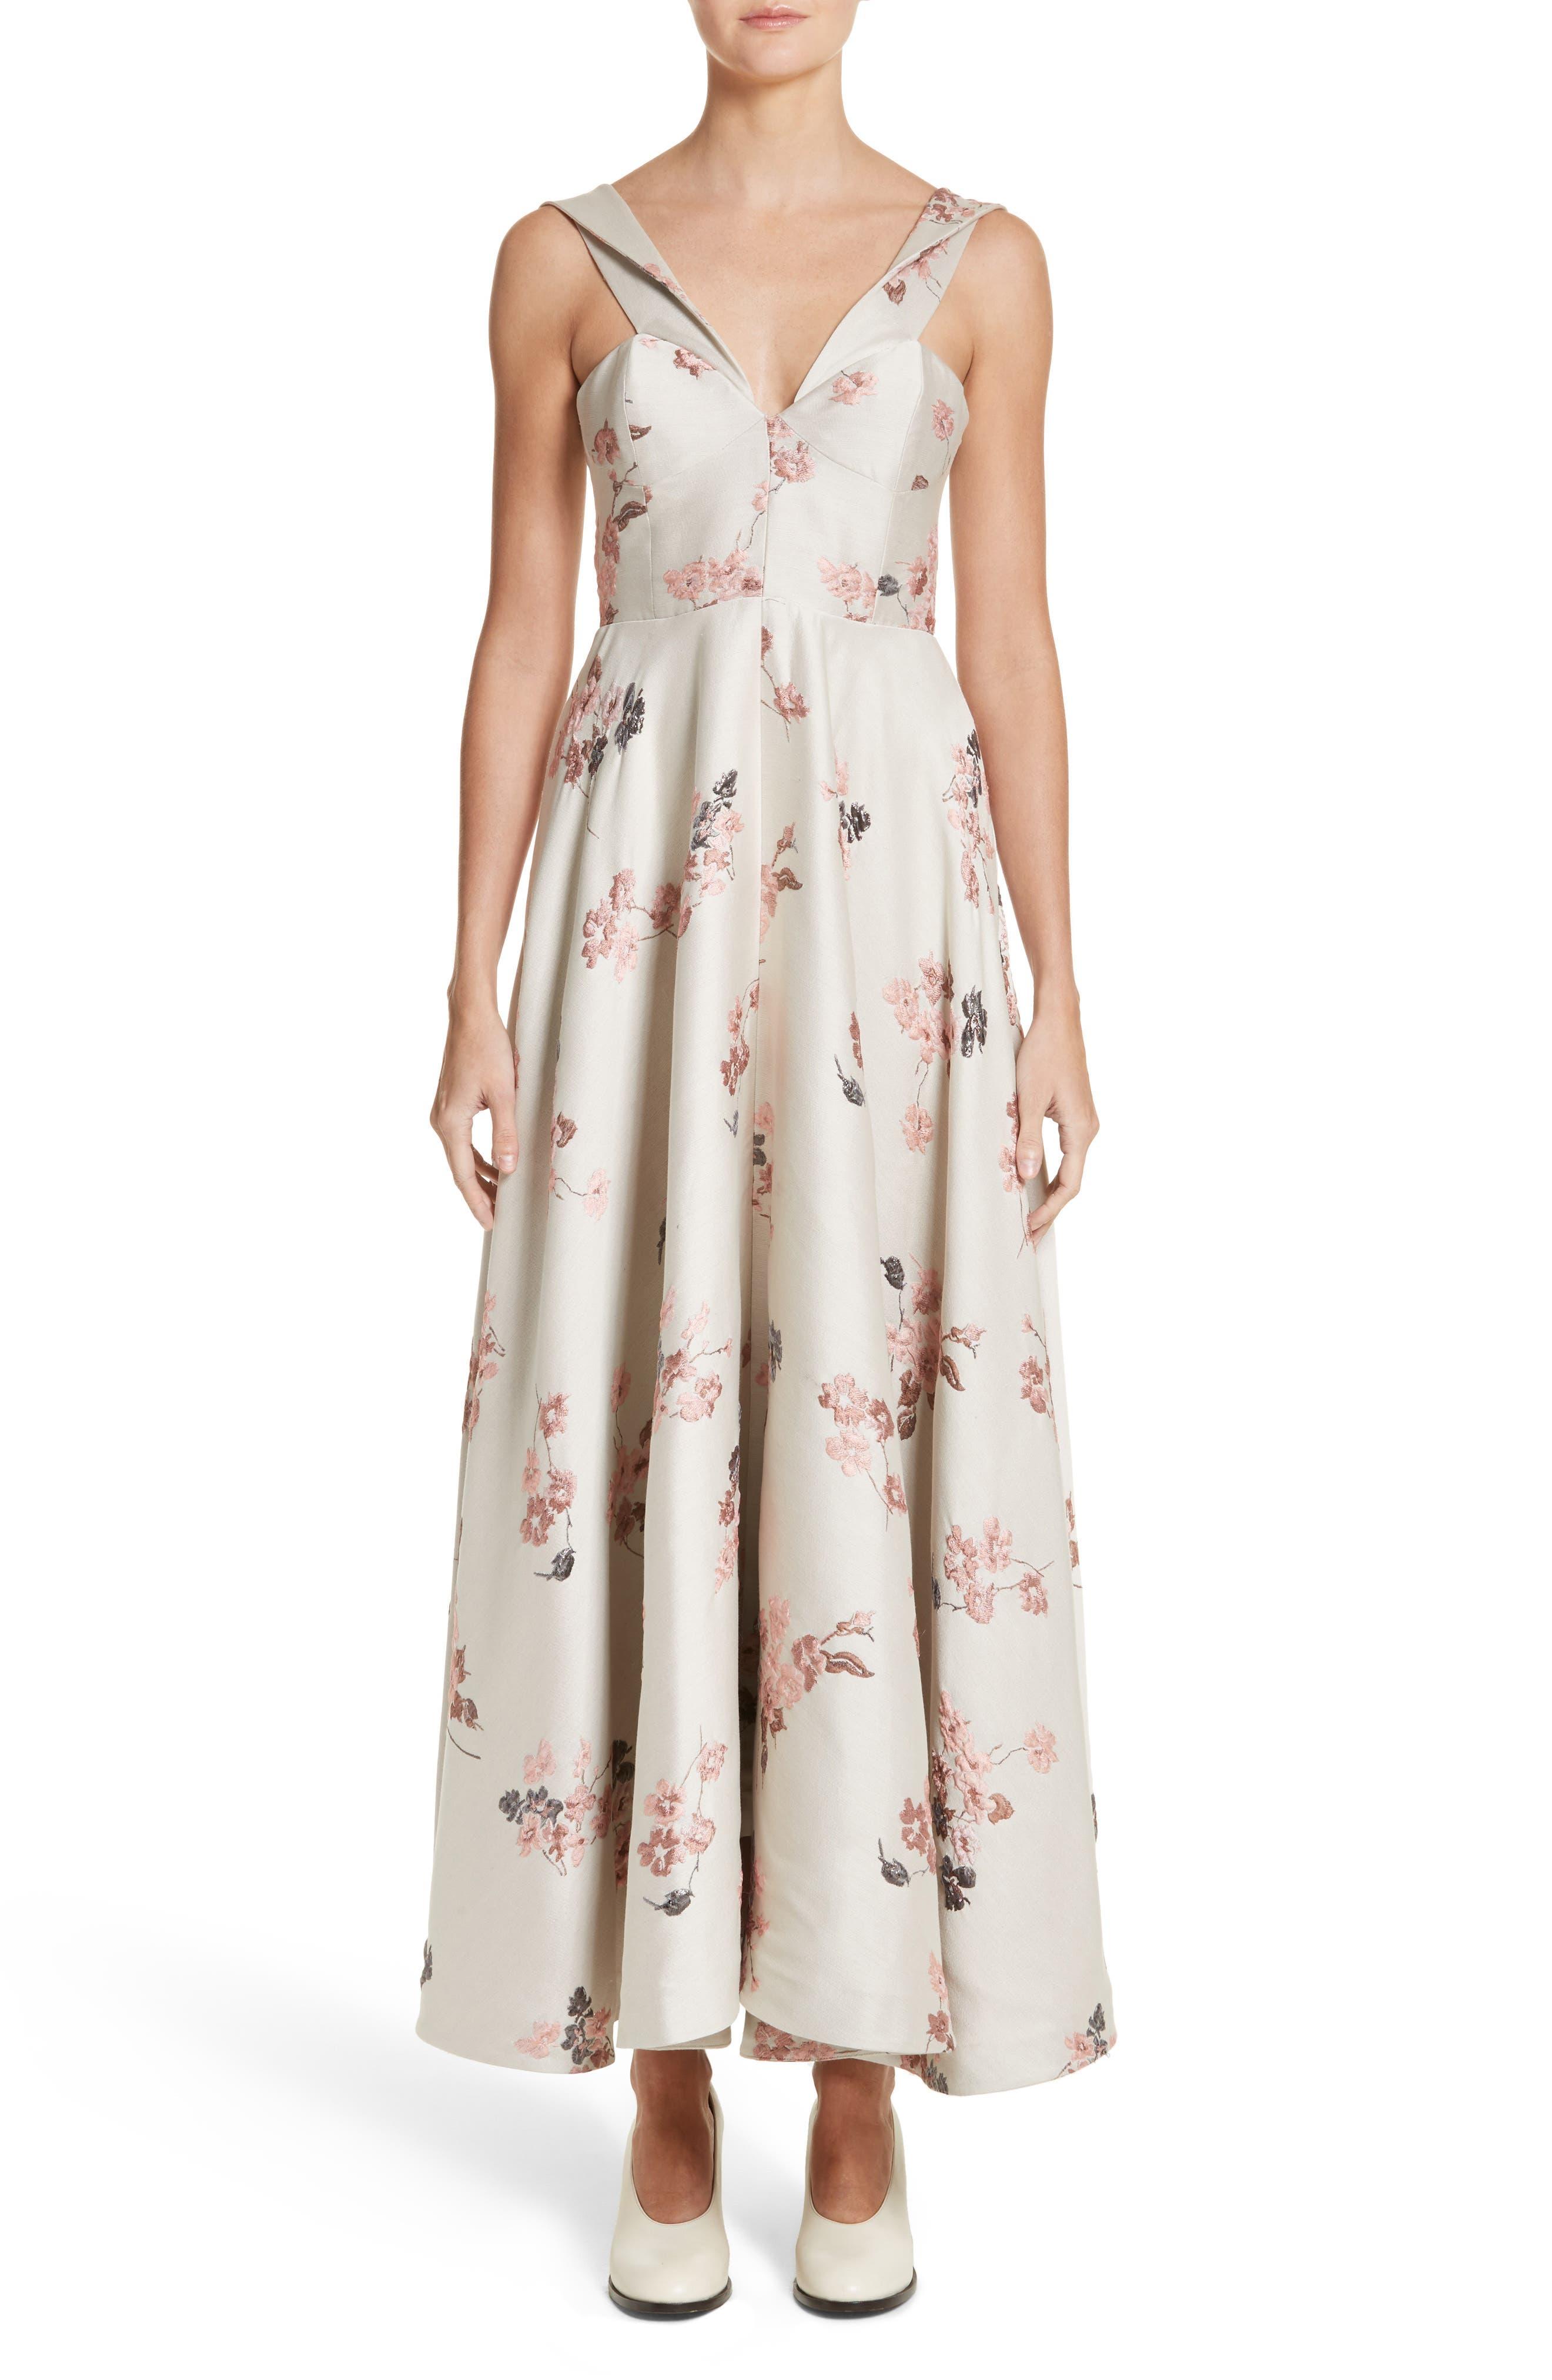 Metallic Floral Jacquard Off the Shoulder Dress,                             Alternate thumbnail 5, color,                             275